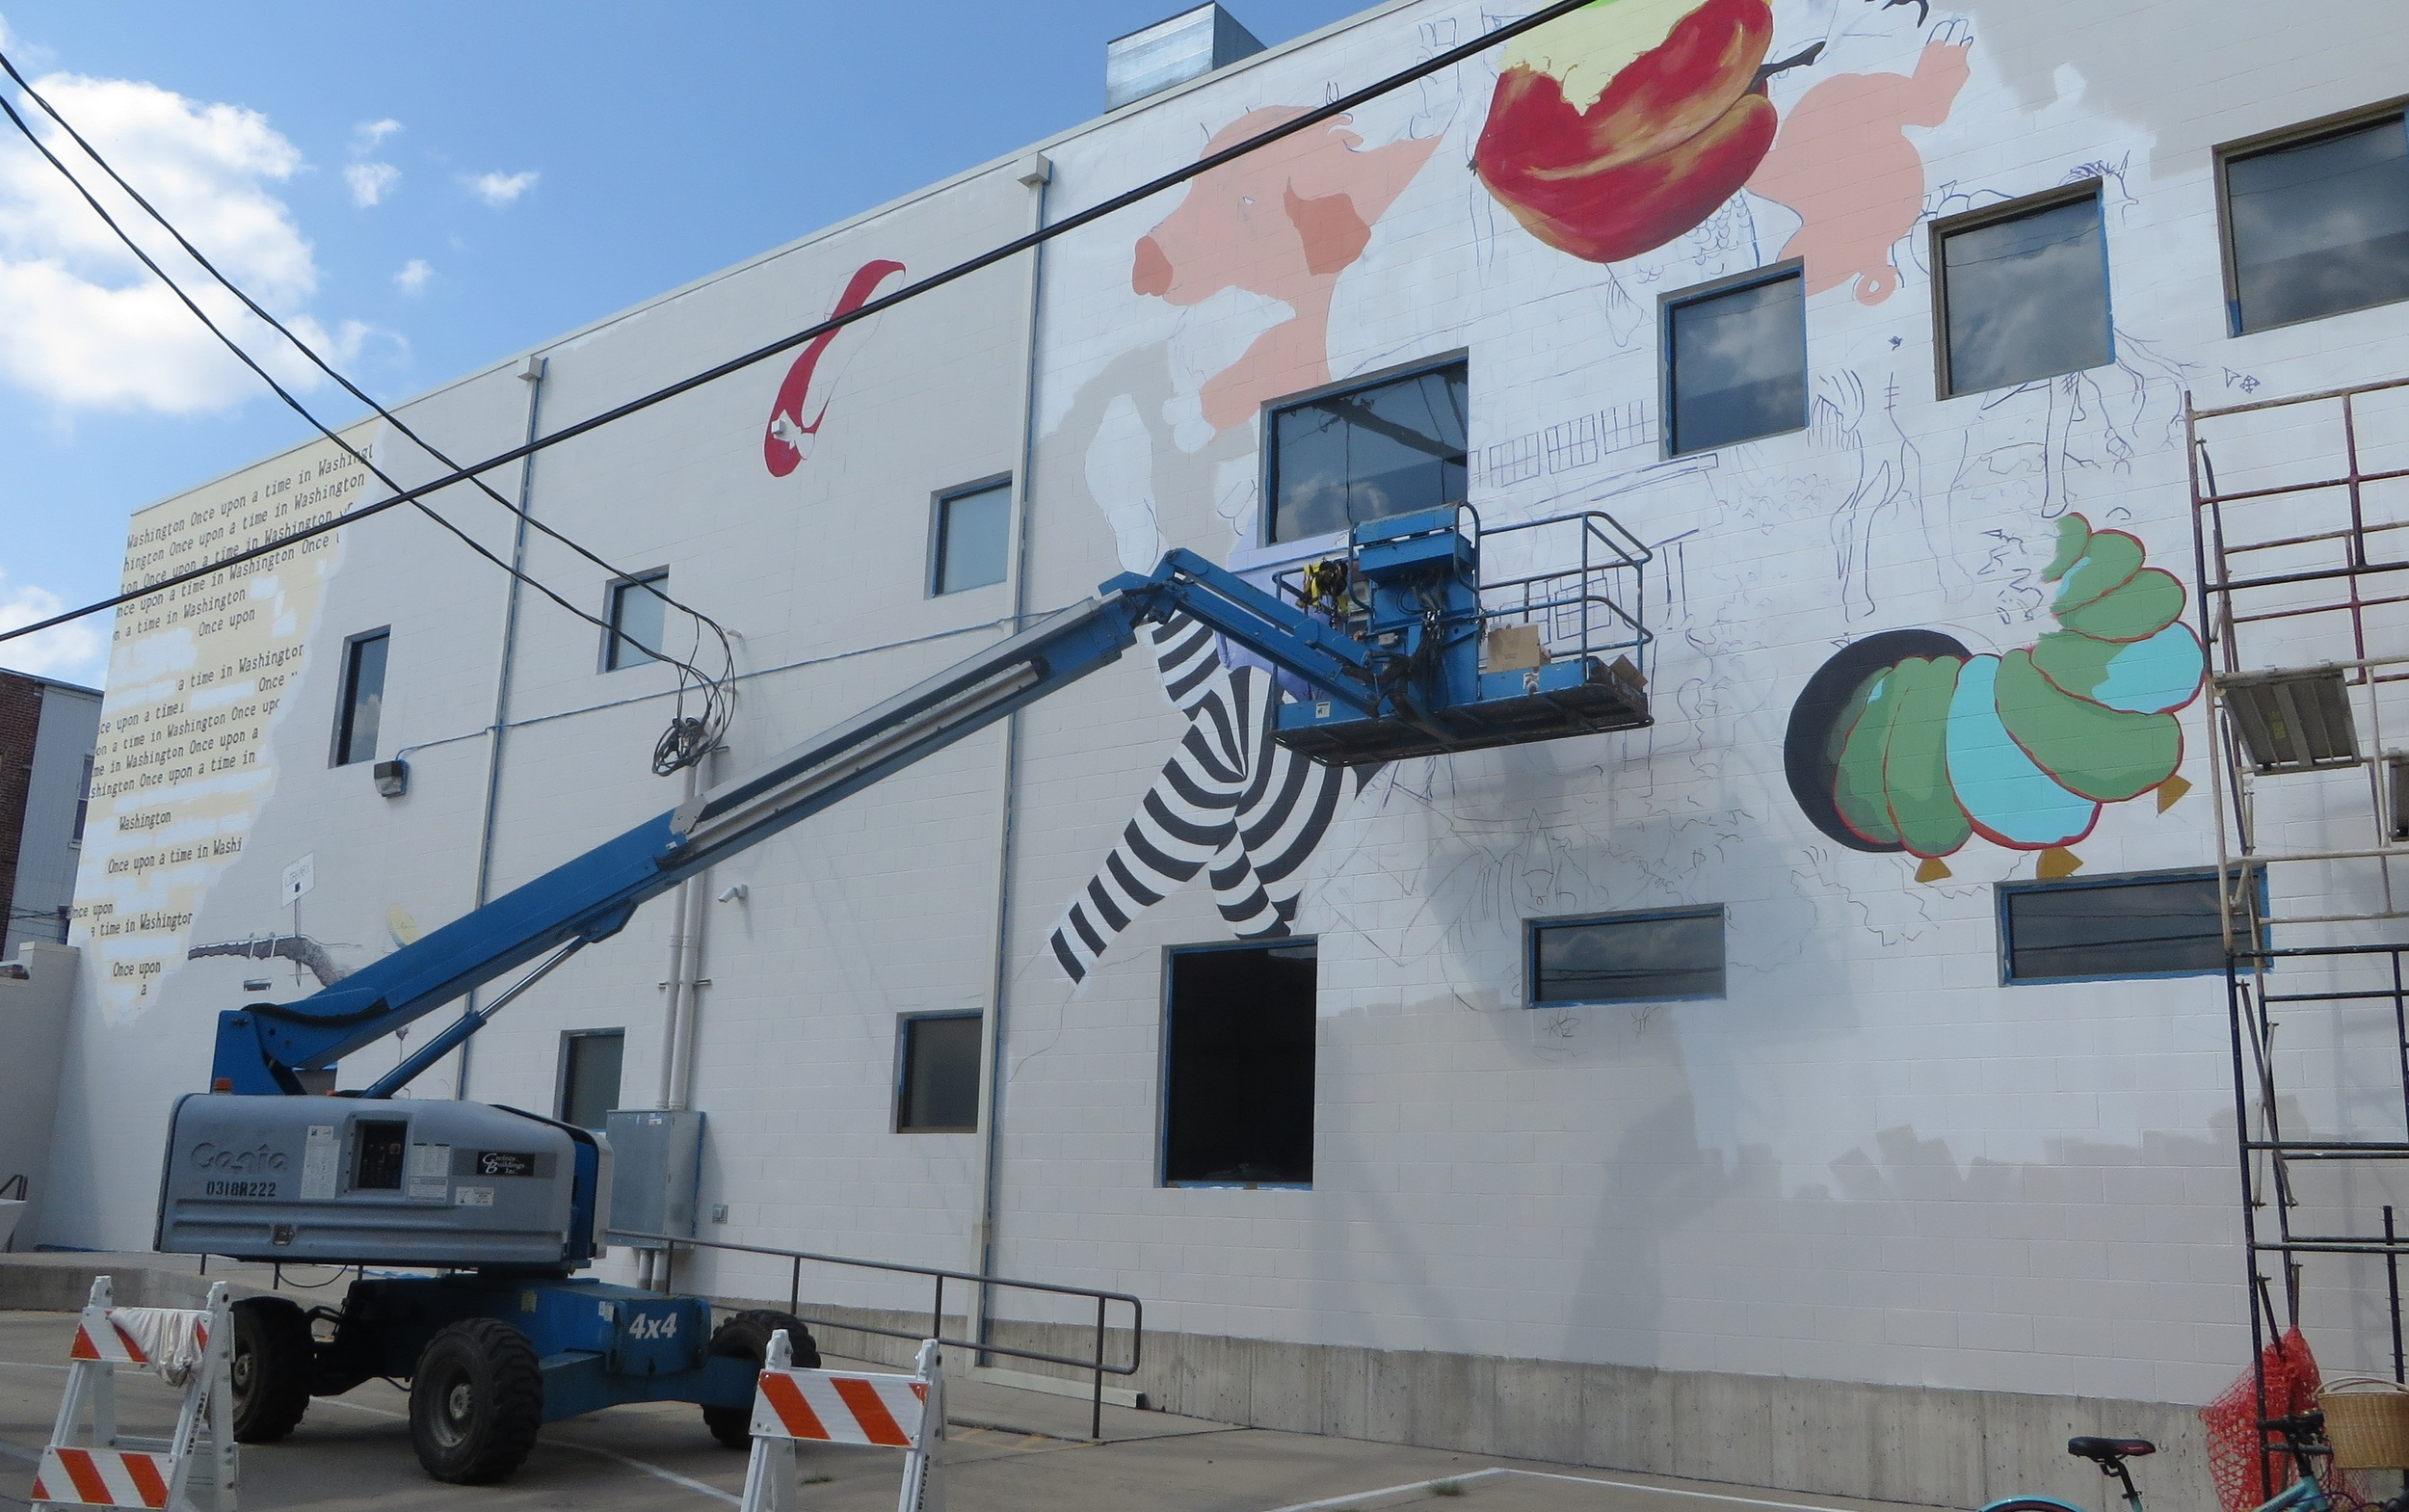 mural work-in-progress   , Image: Sally Y. Hart and kciiradio.com, Monday, September 7th, 2015.